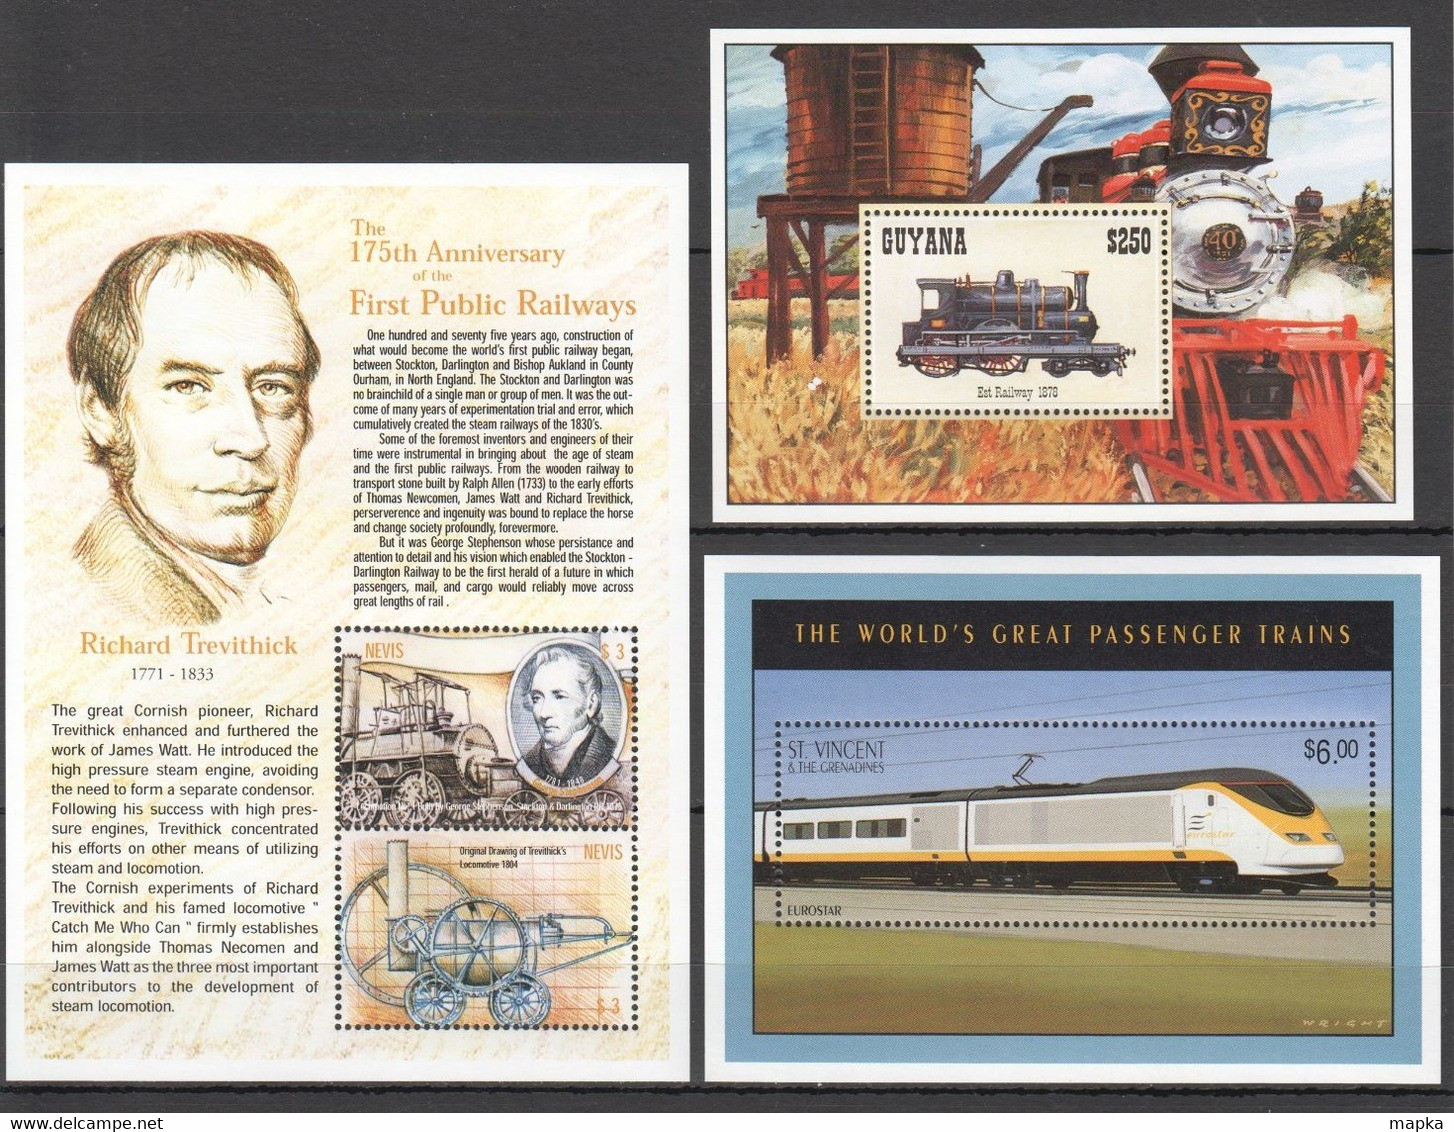 QQ976 NEVIS GUYANA TRANSPORT TRAINS TREVITNICK LOCOMOTIVES WORLD'S GREATEST LOCOMOTIVES 3BL MNH - Trains